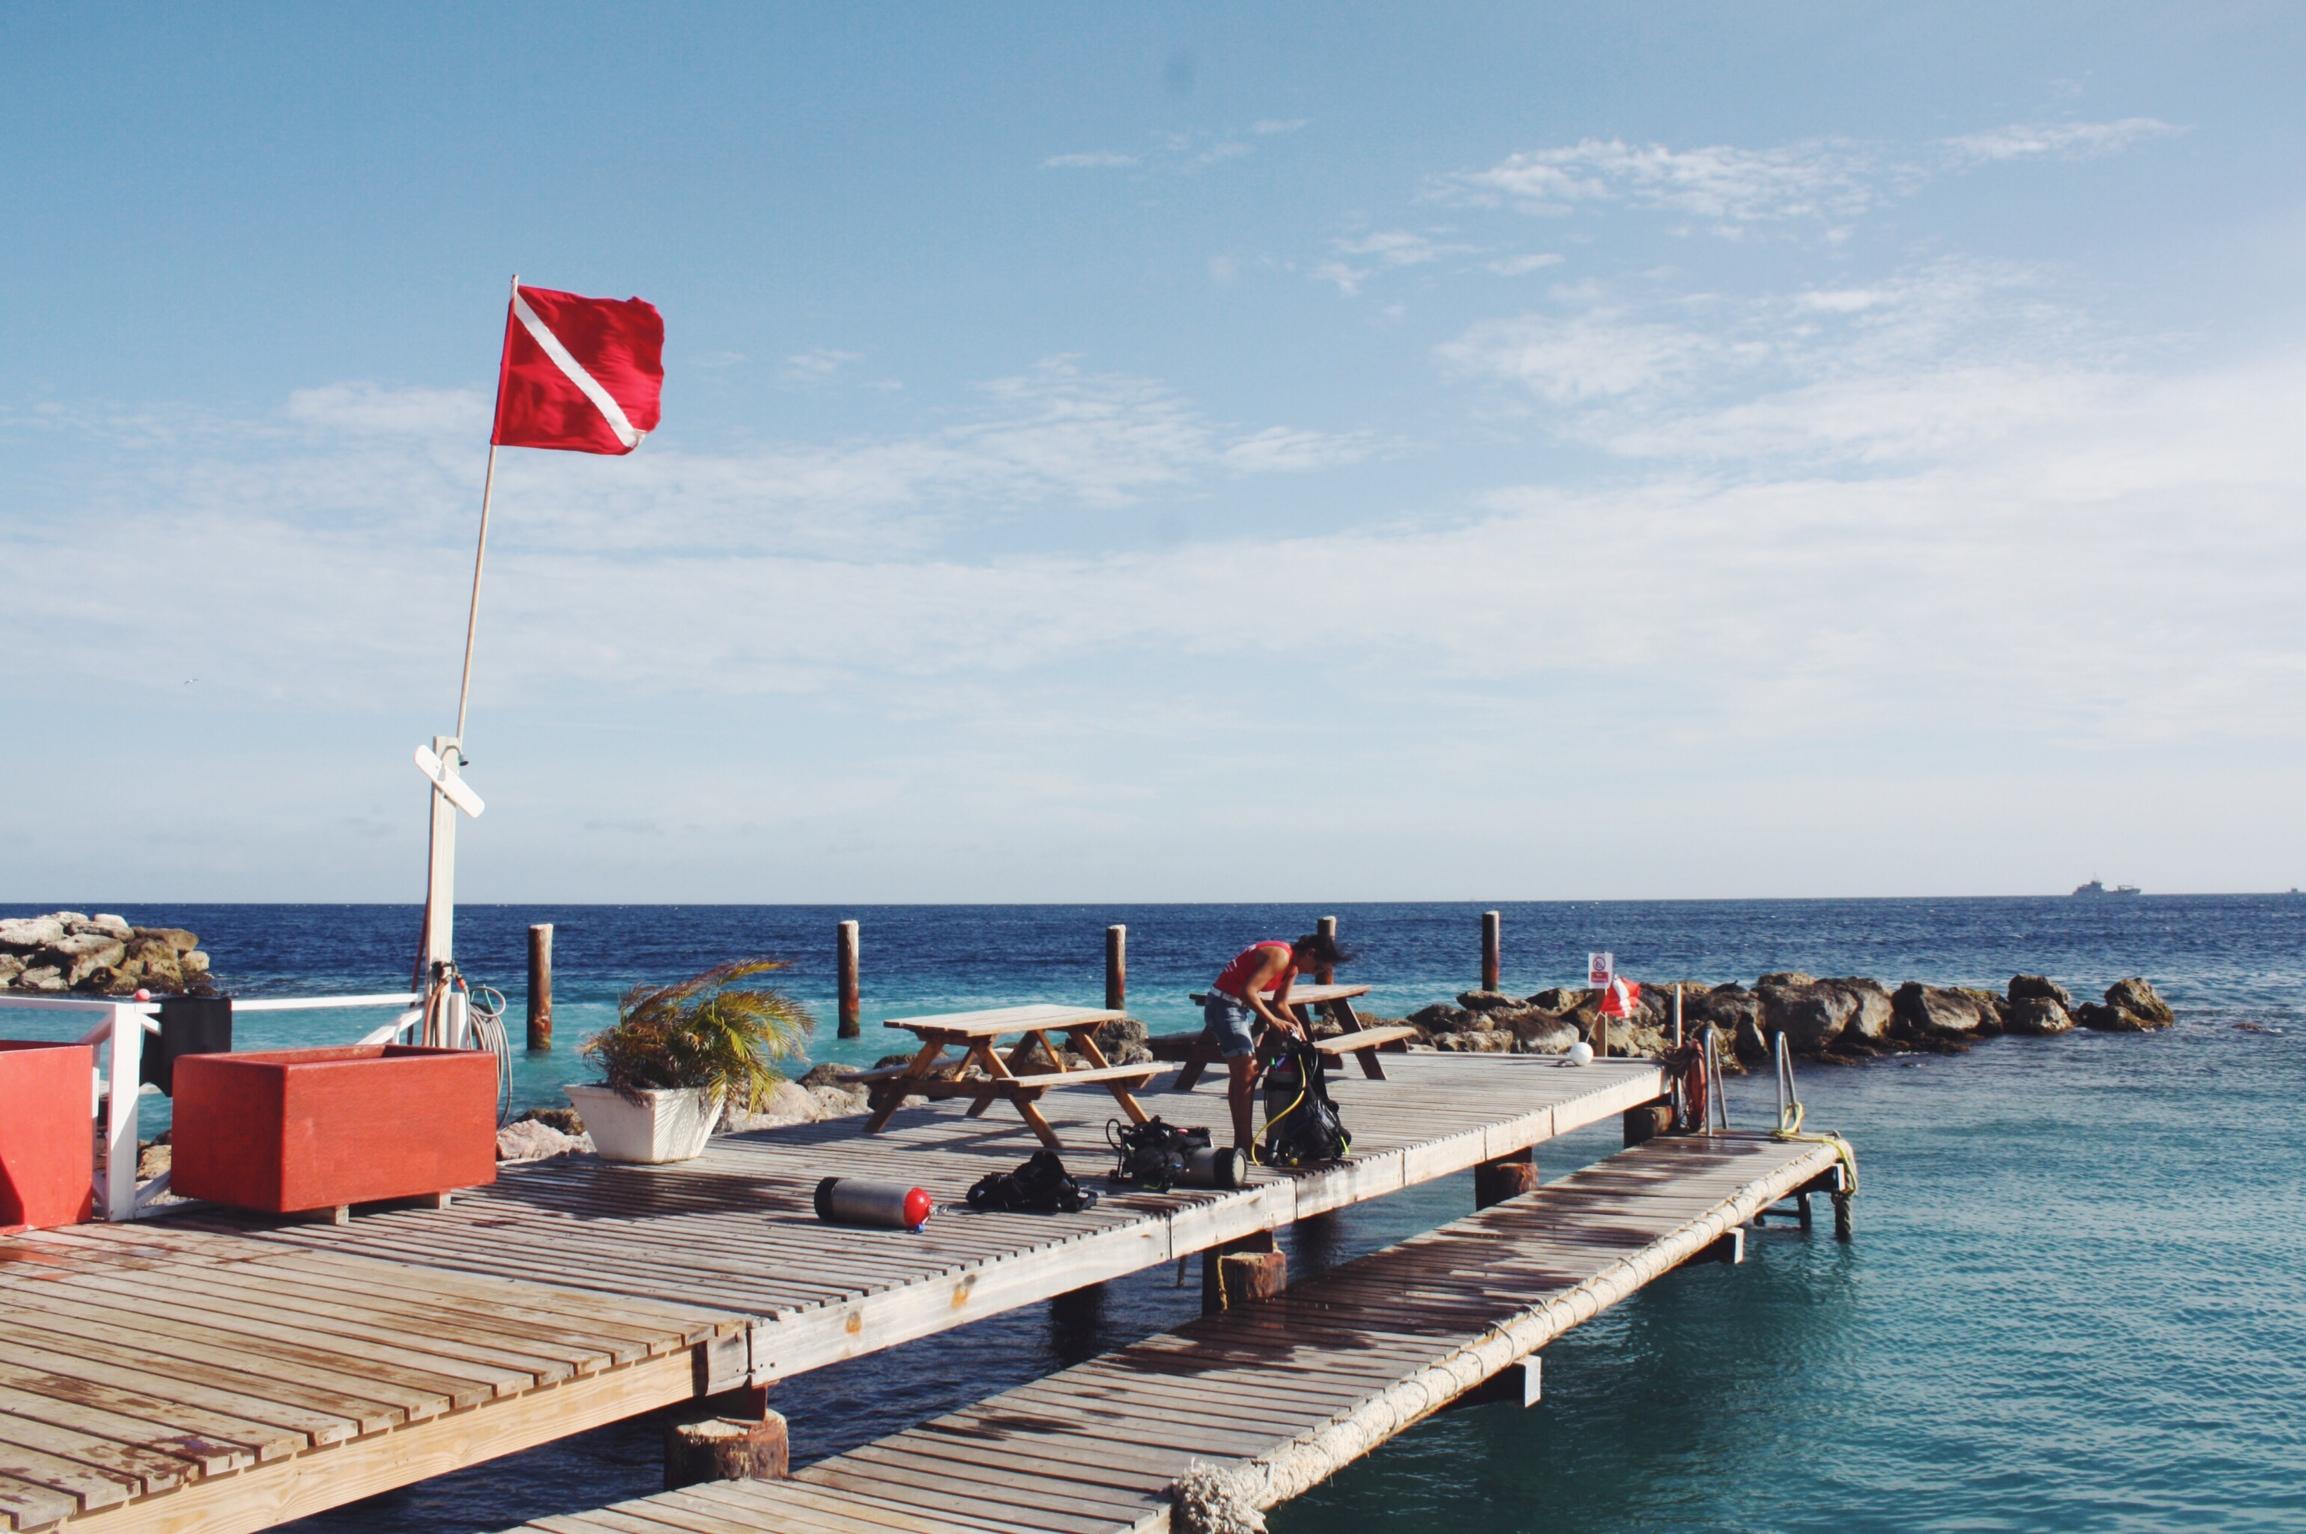 Tauchen Curacao Go West Diving, Alice im Wunderland Riff